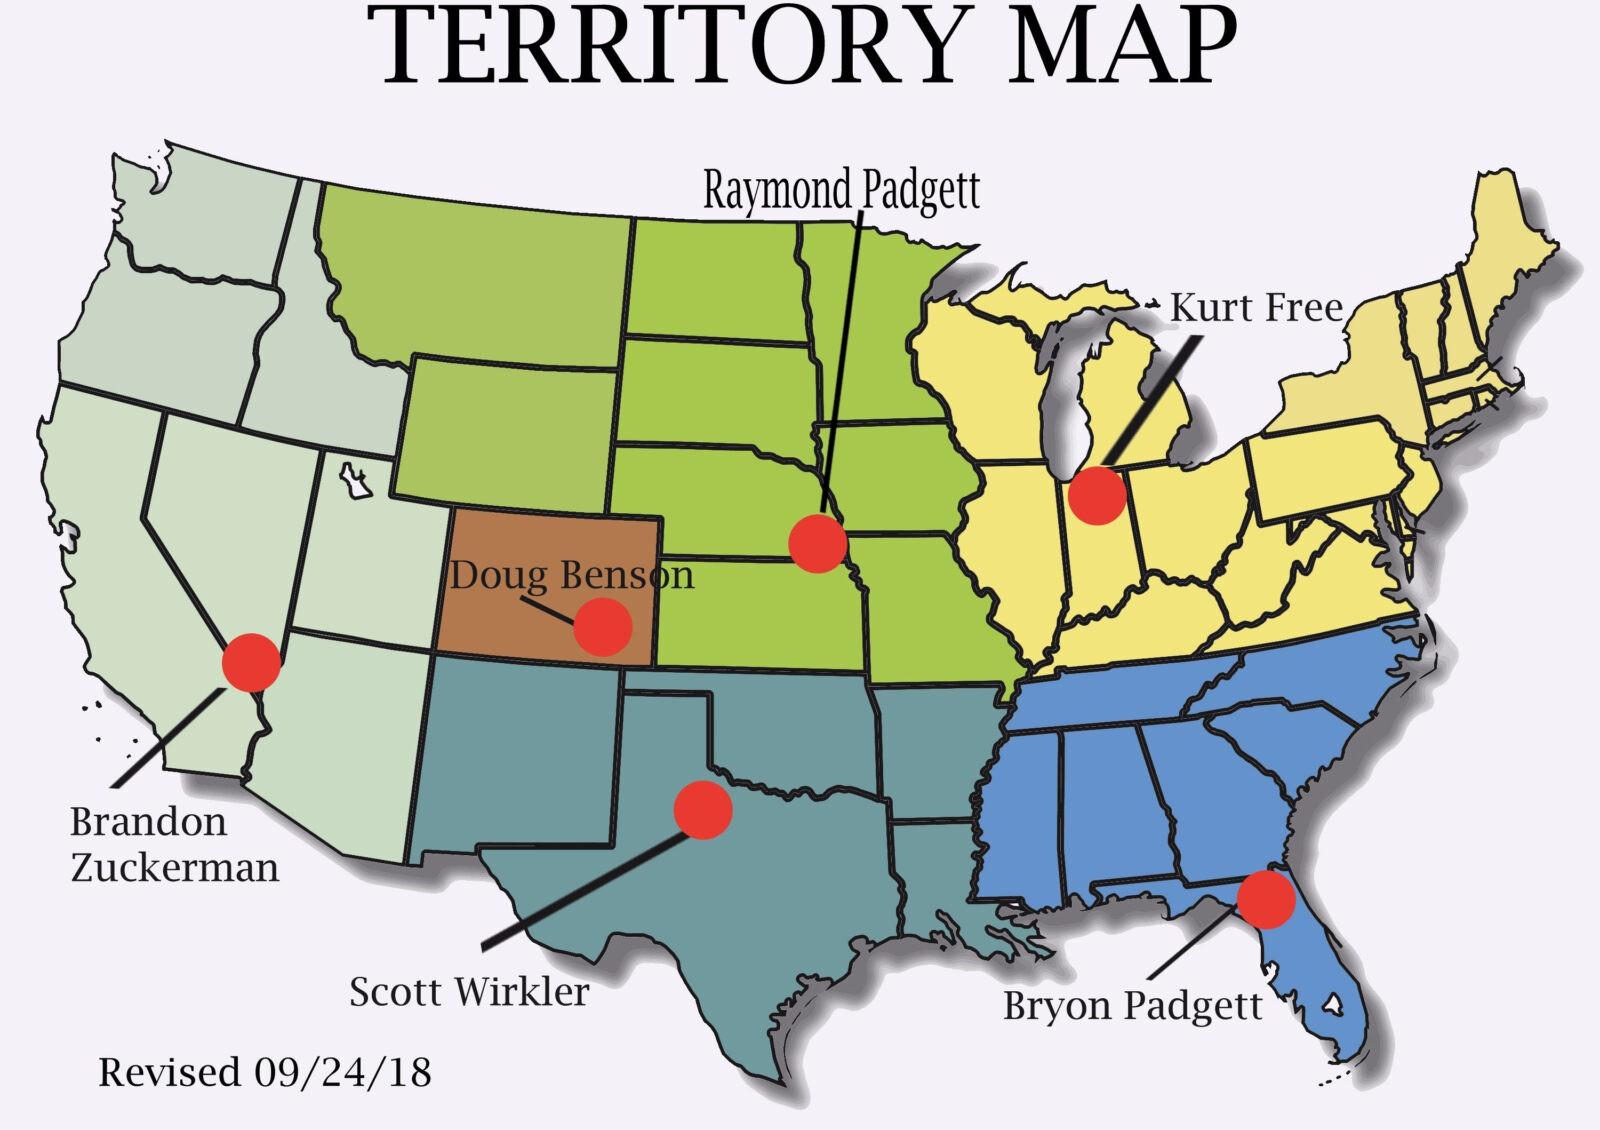 TERRITORY-MAP---09.24.18